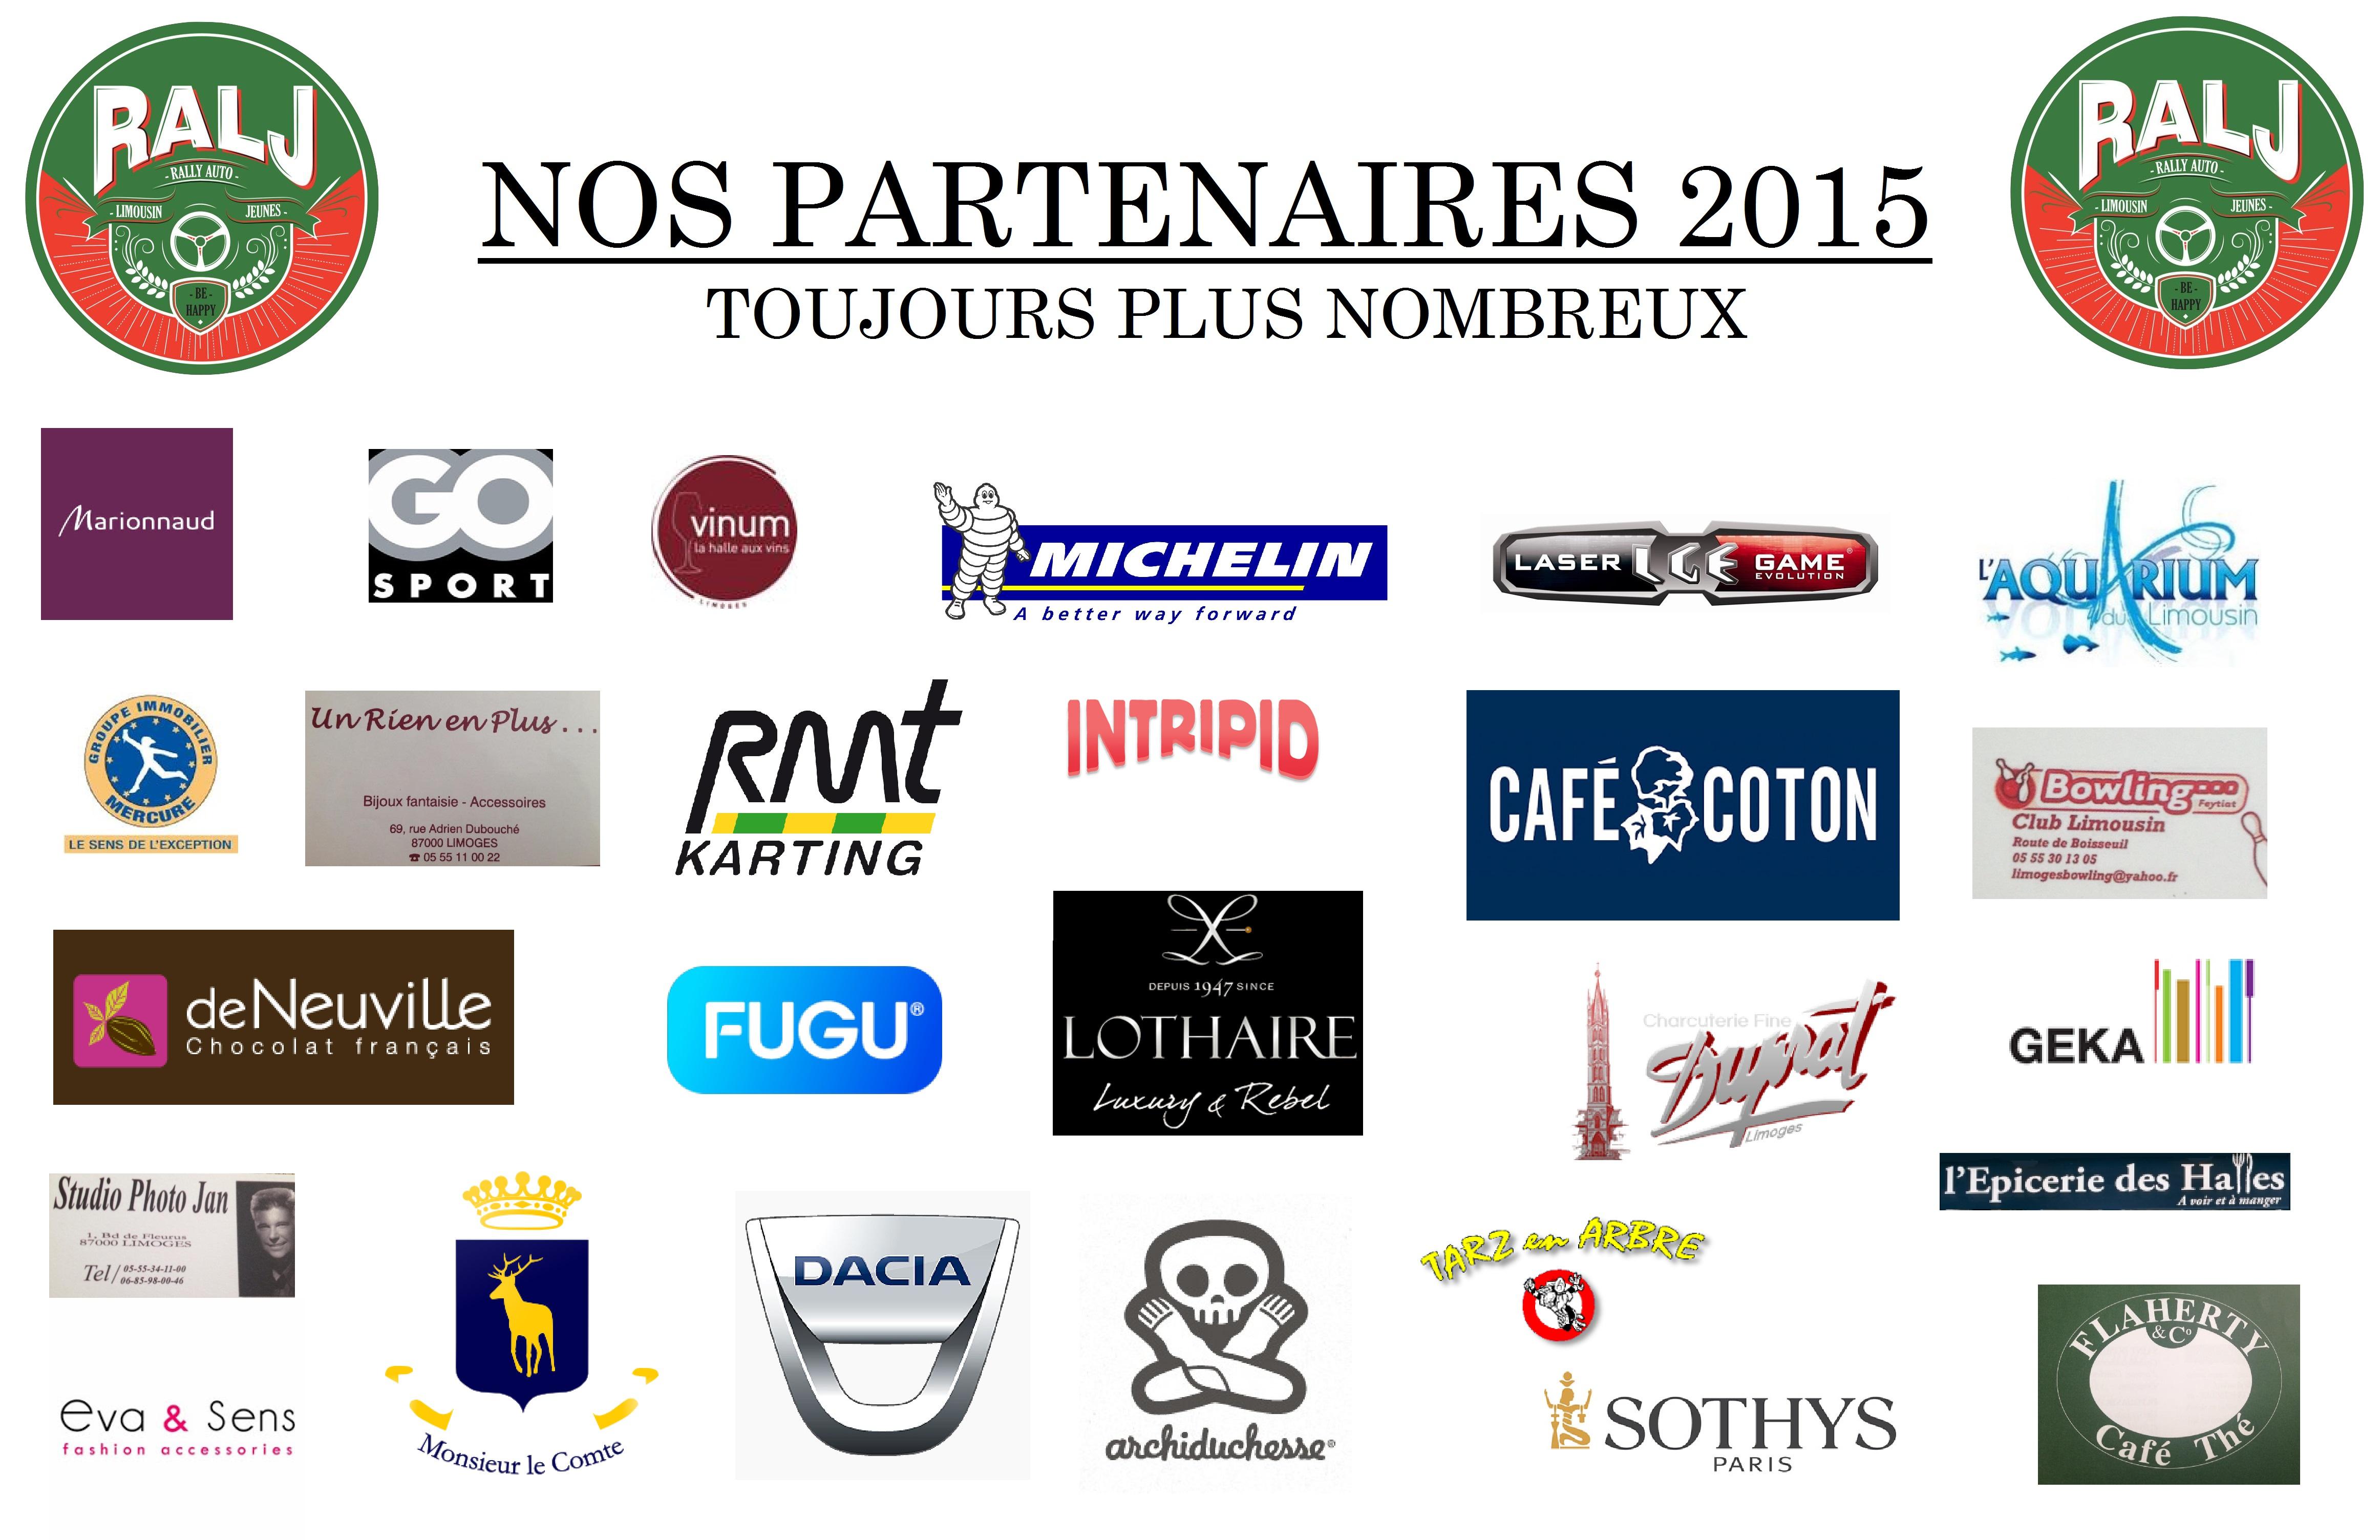 Partenaires RALJ 2015